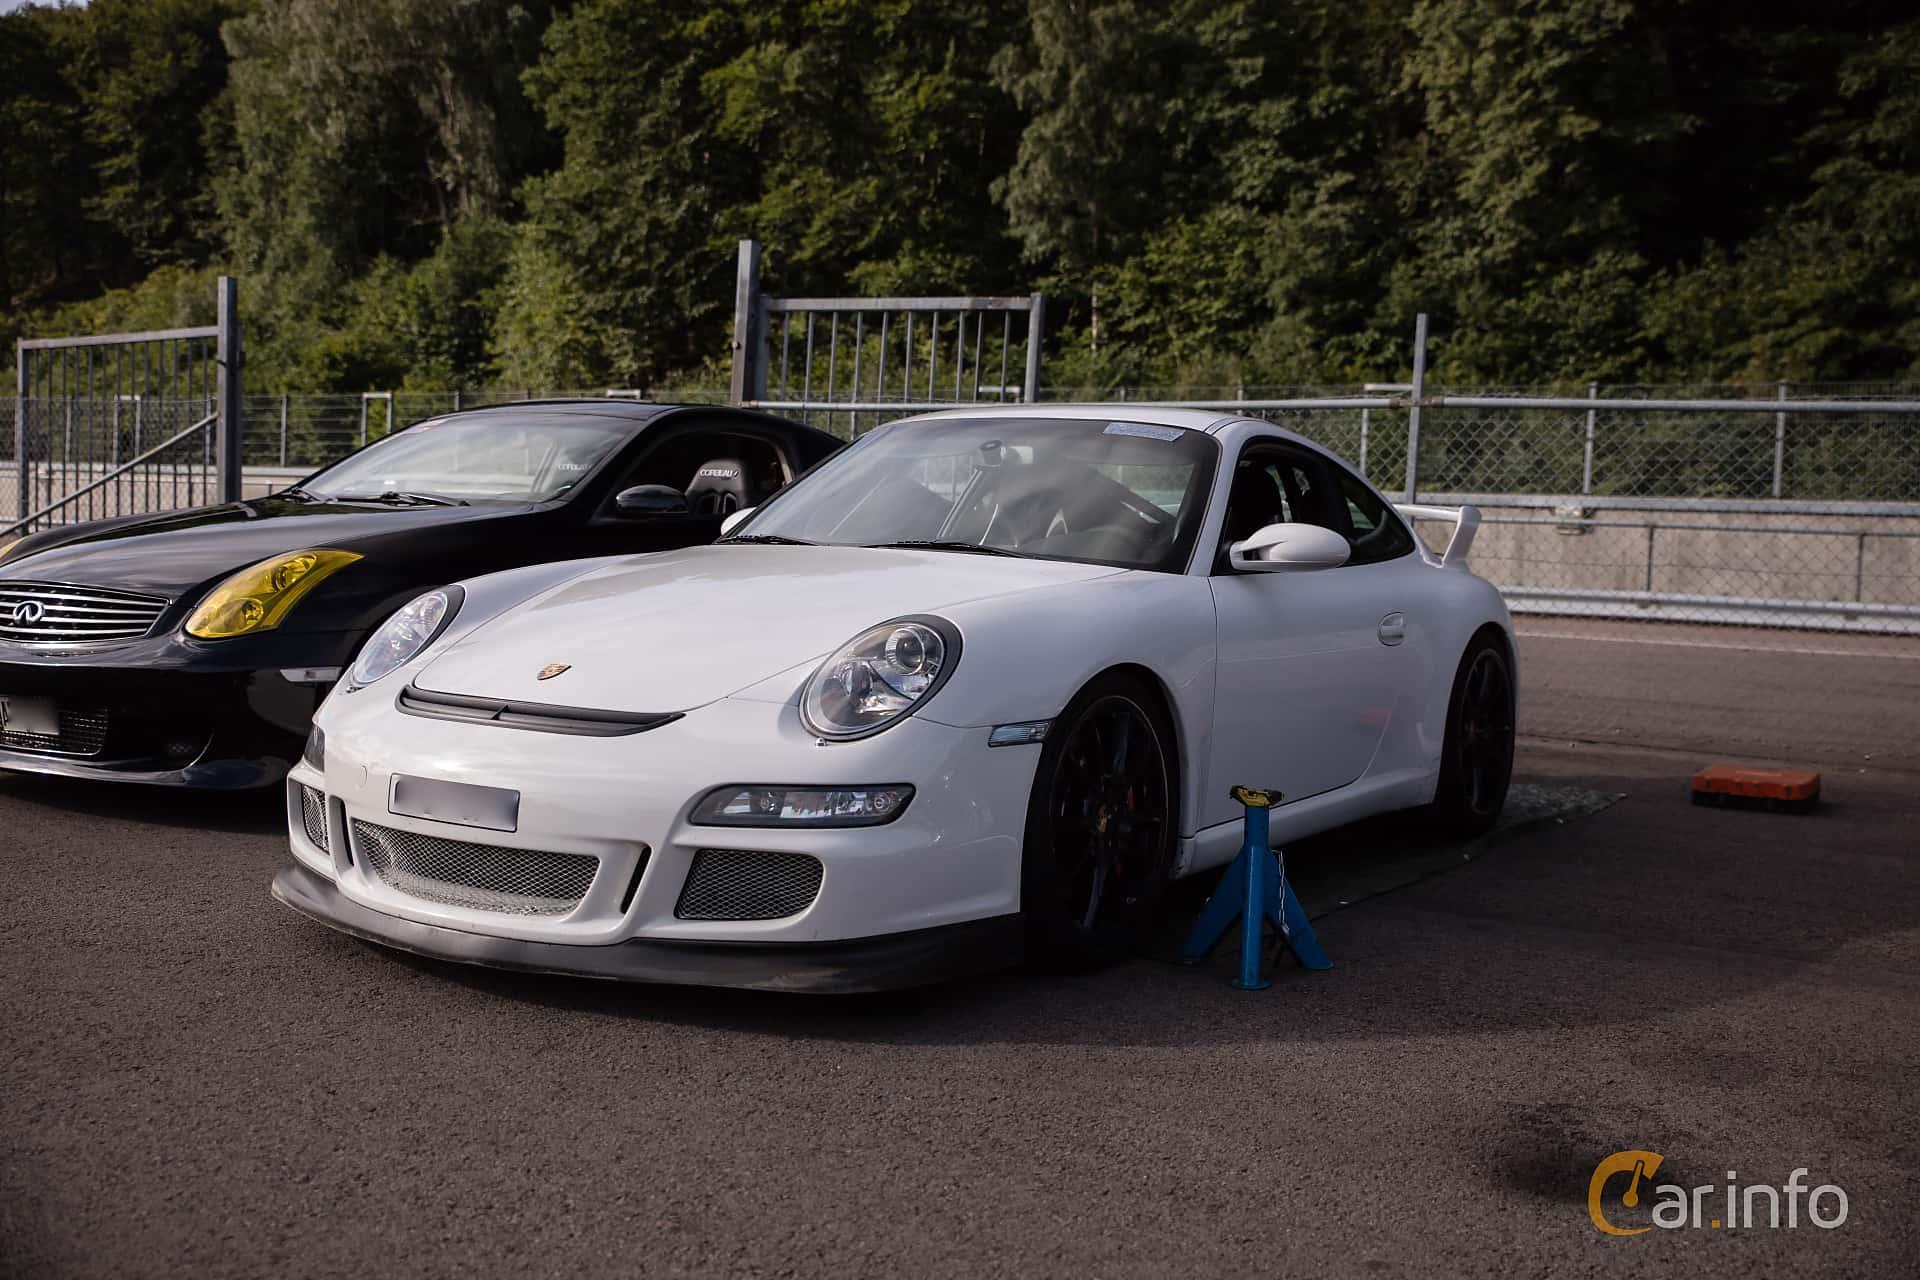 Porsche 911 GT3 3.6 H6 Manuell, 415hk, 2007 at JapTuning Trackday 2018 Knutstorp